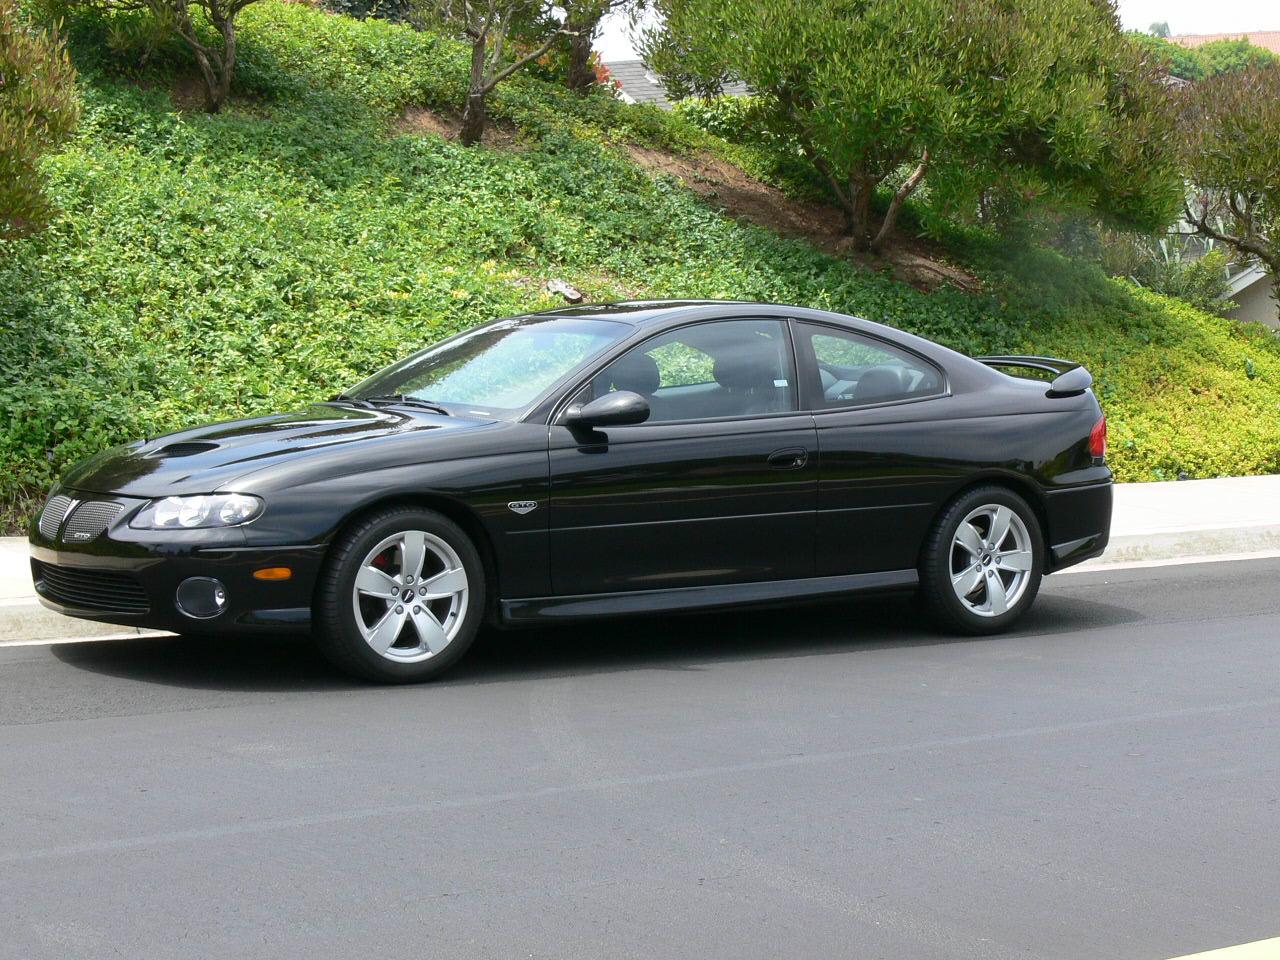 Ford Dealers Phoenix >> 2005 Pontiac GTO - Pictures - CarGurus